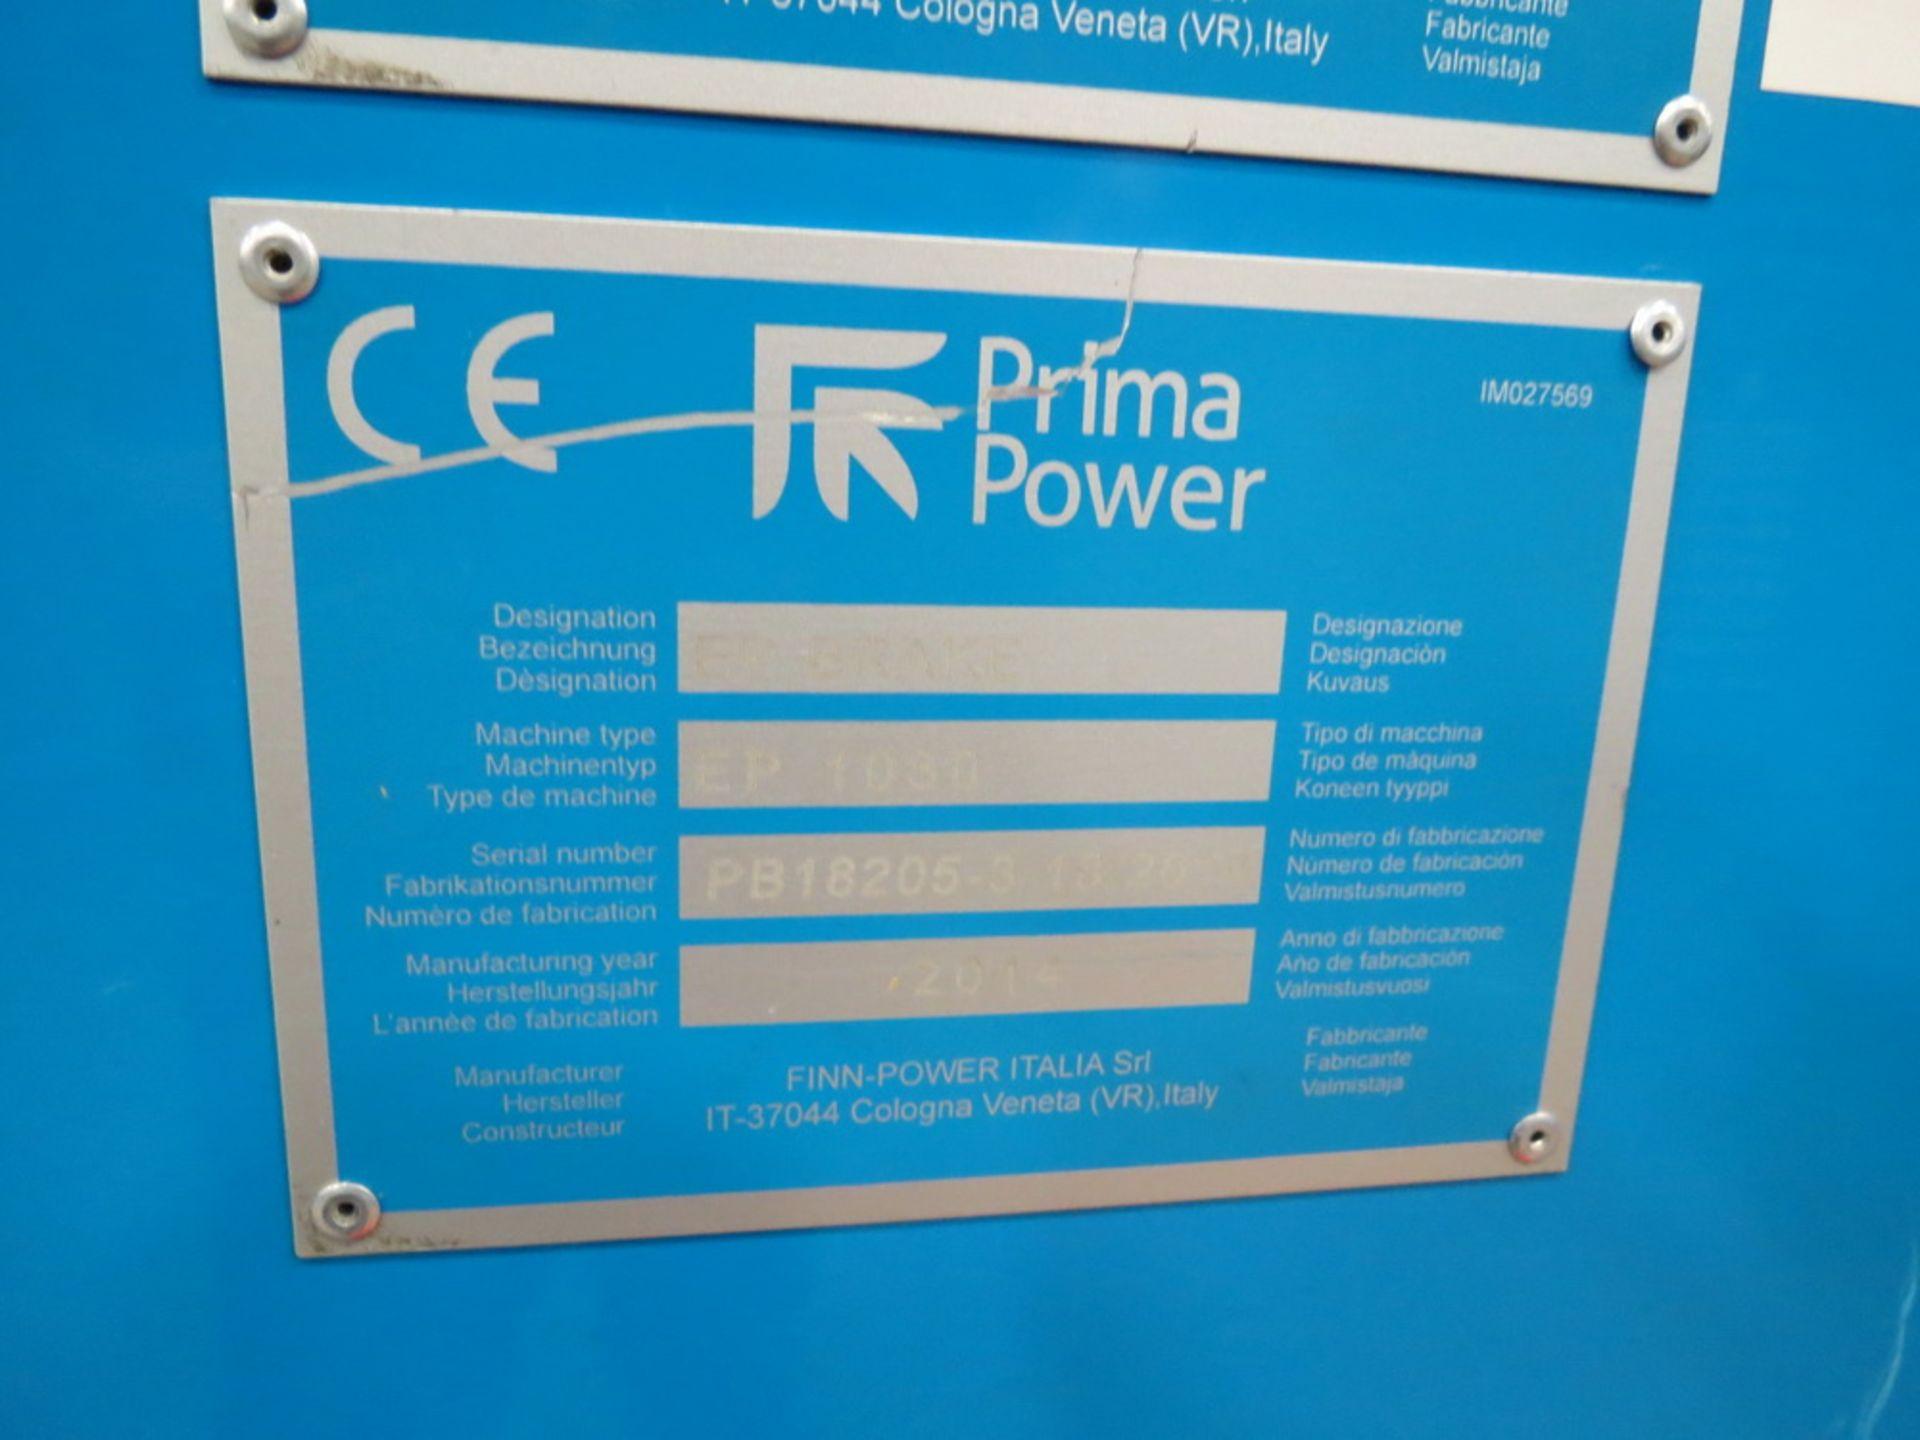 Lot 58 - 2014 Prima EP1030 3 Meter Electric Servo Press Brake